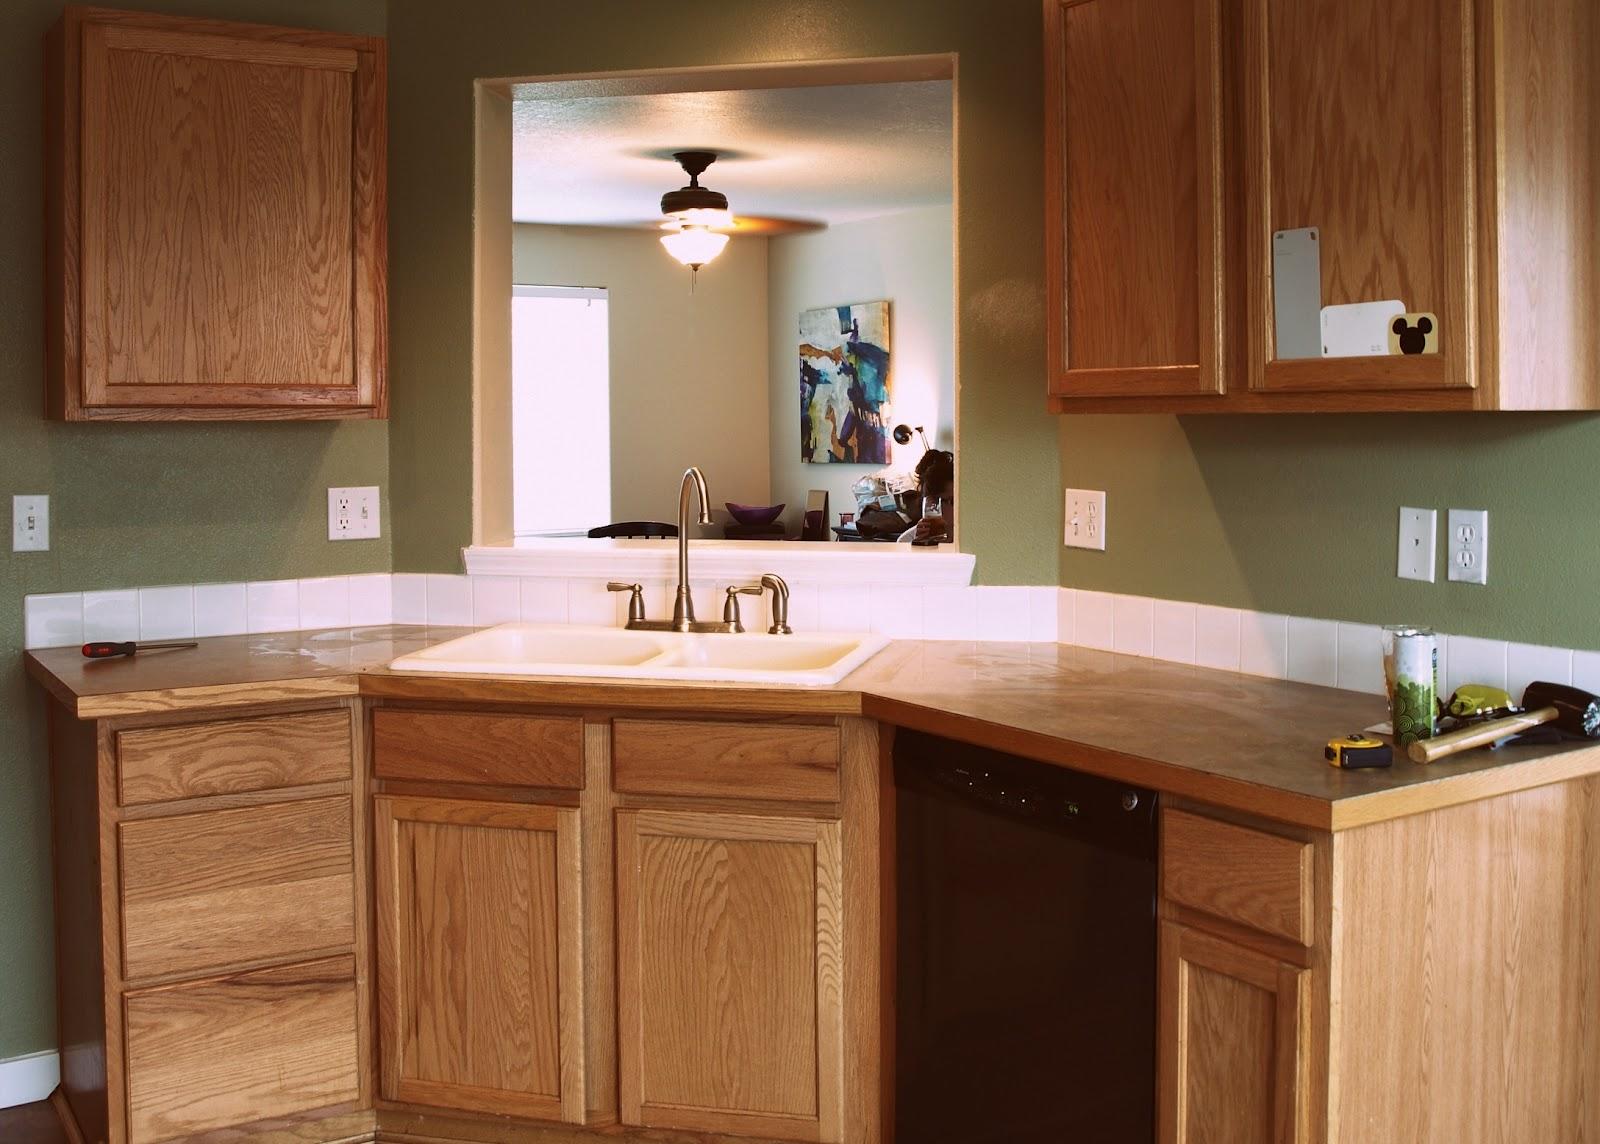 painted granite countertops tutorial kitchen countertops options Painted Granite Countertops Tutorial